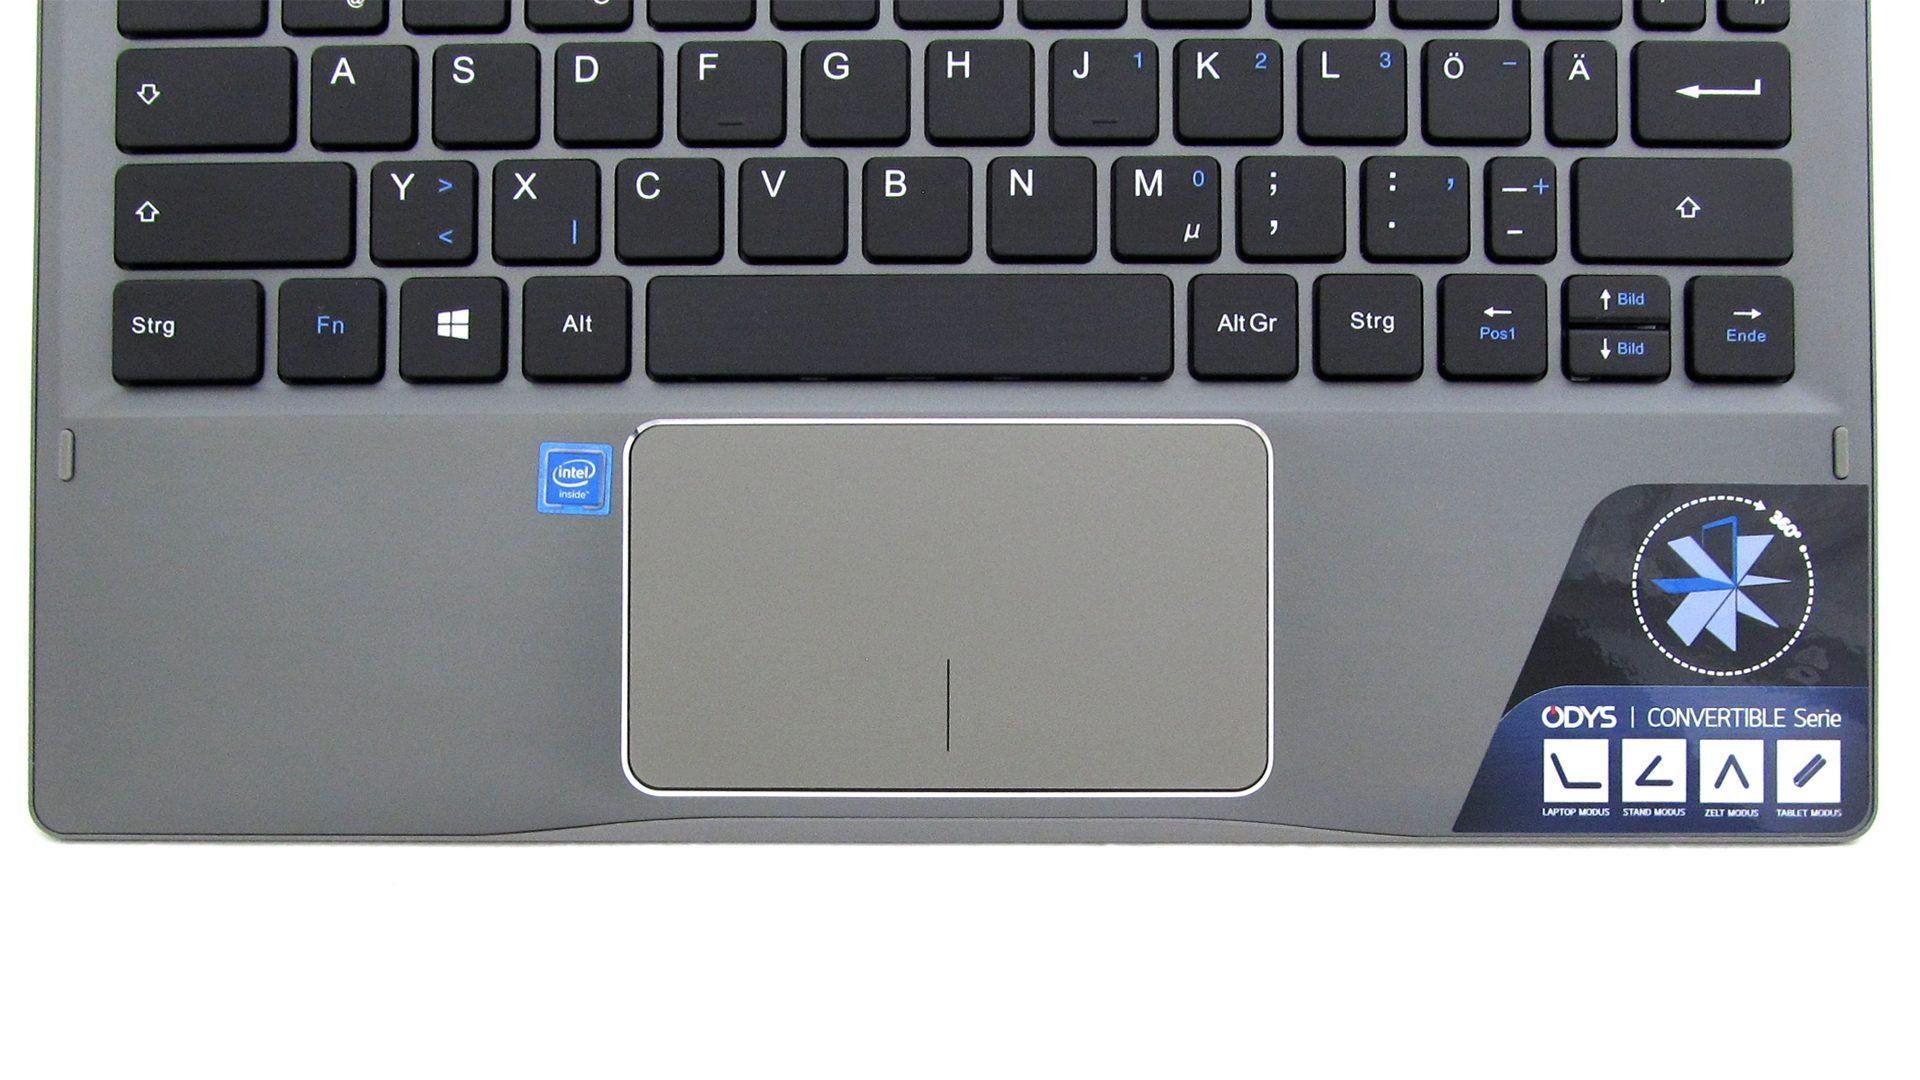 odys-vario-pro-tastatur_1